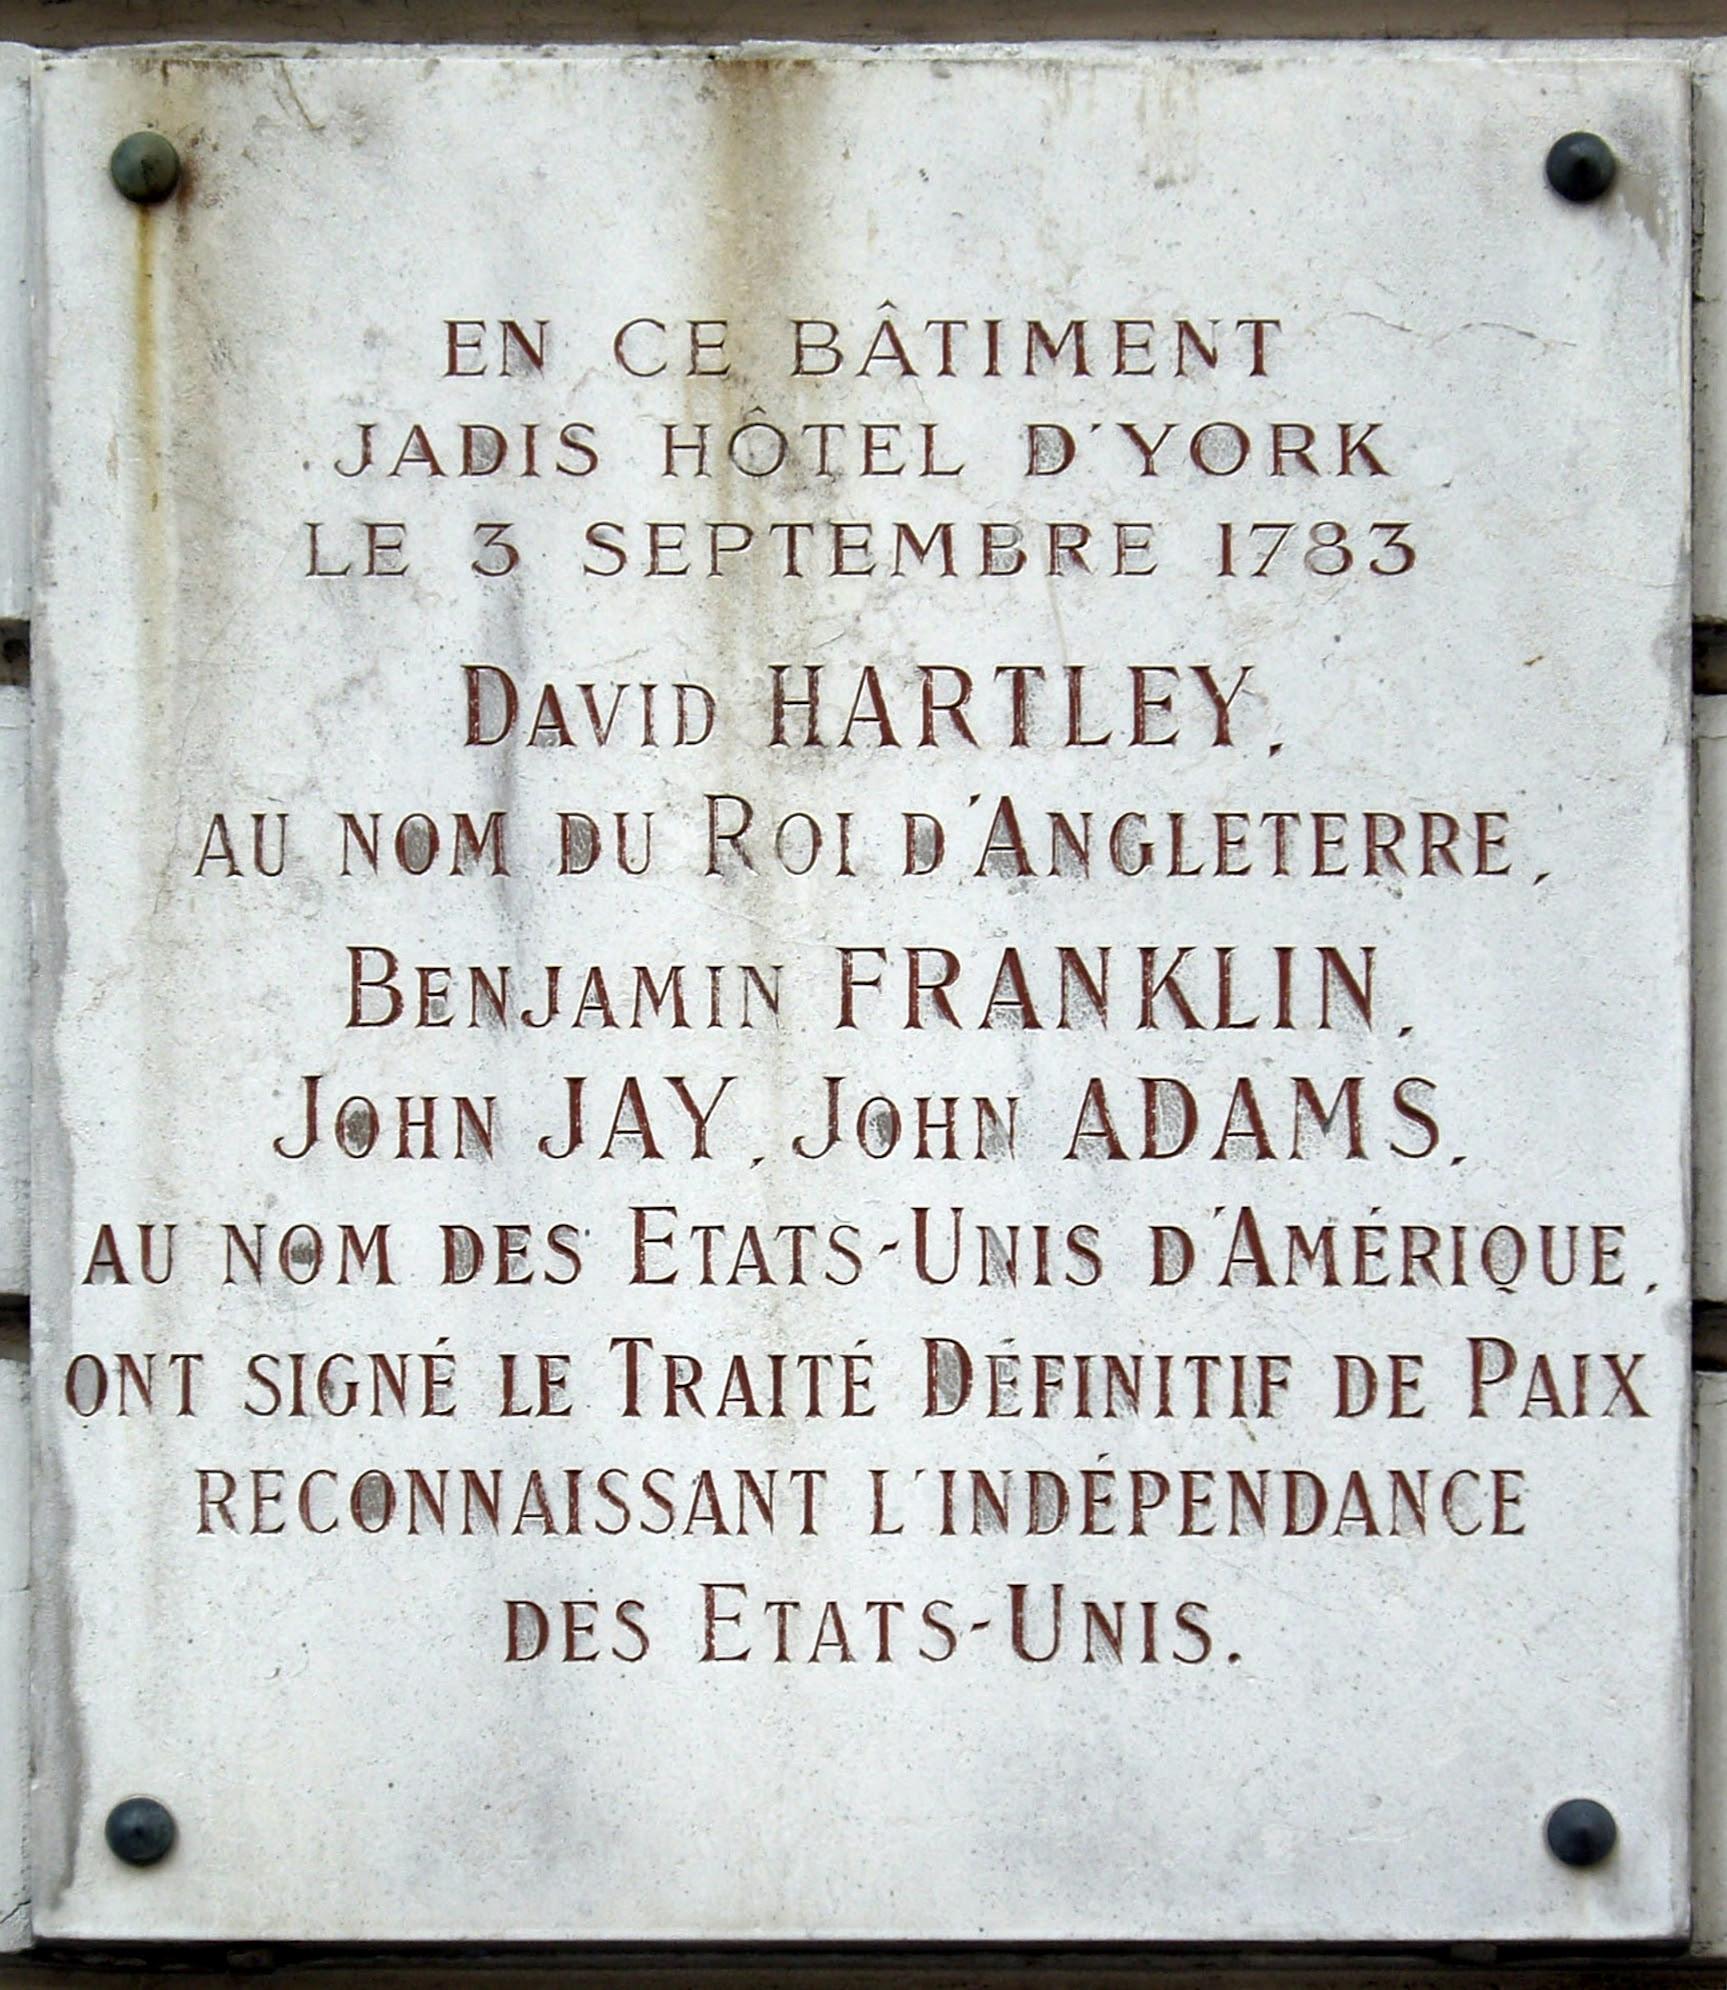 Plaque commemorating the Treaty of Paris of 1783